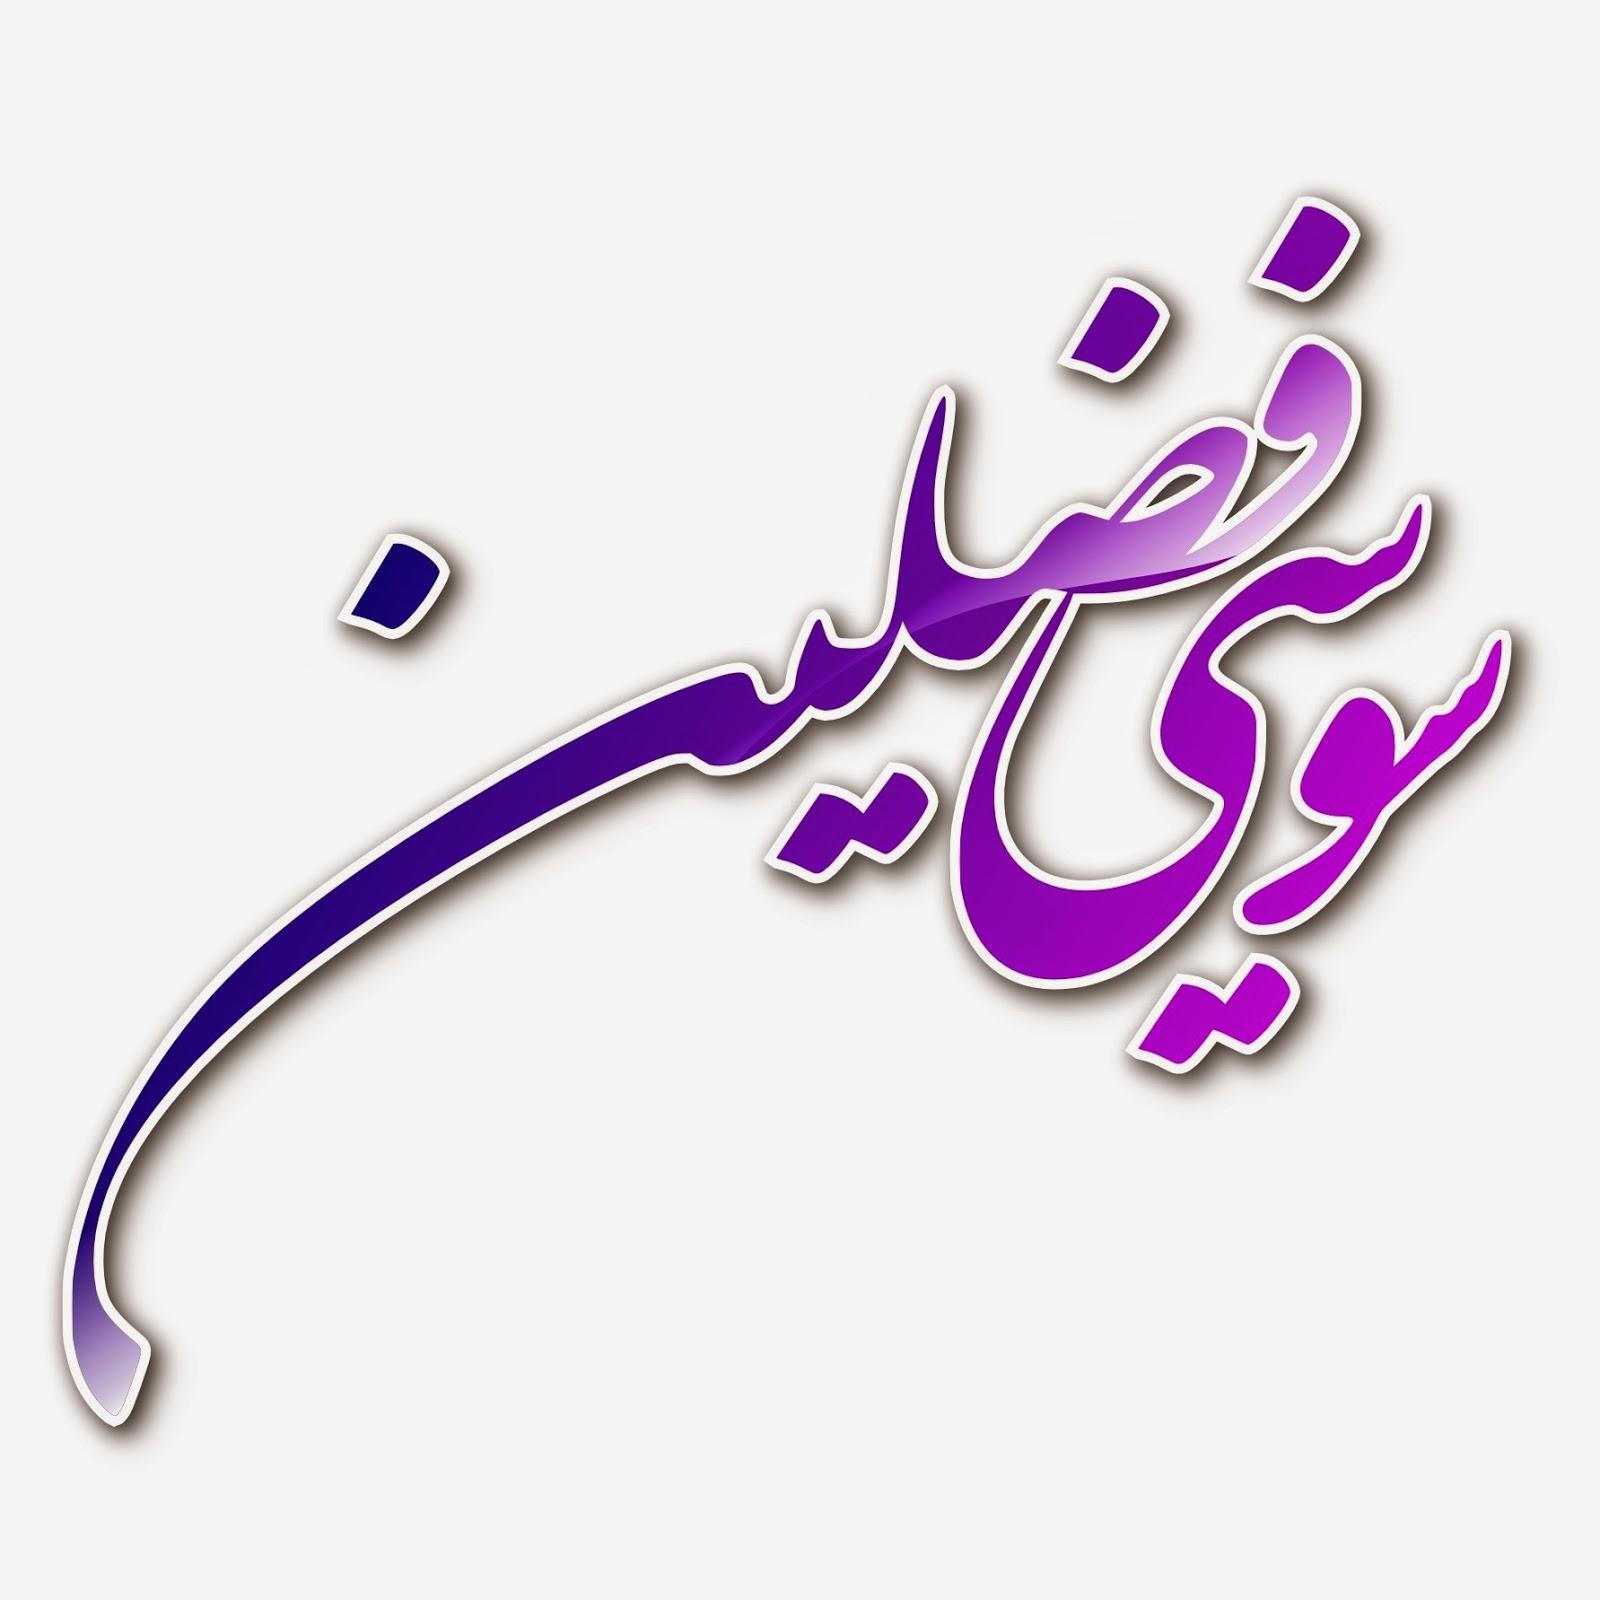 Penulisan nama dengan manggunakan kaligrafi arab dipadu dengan aplikasi disain grafis inkscape